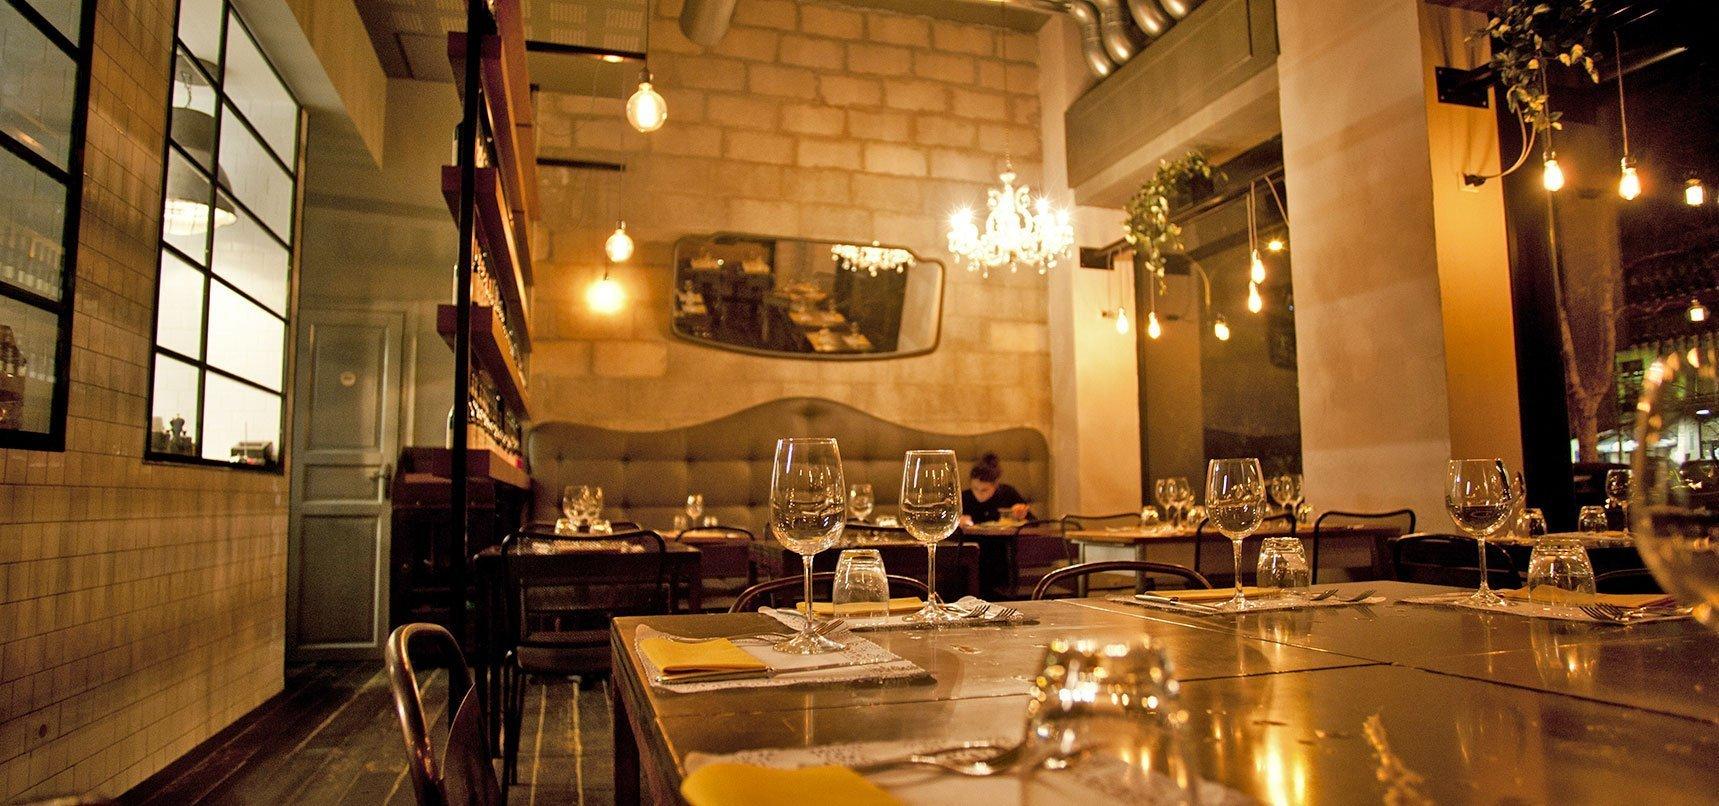 arredamento locali pubblici, bar, ristoranti, caffetterie, panifici, paninoteche, pizzerie, cocktail bar, wine bar, enoteche, street food